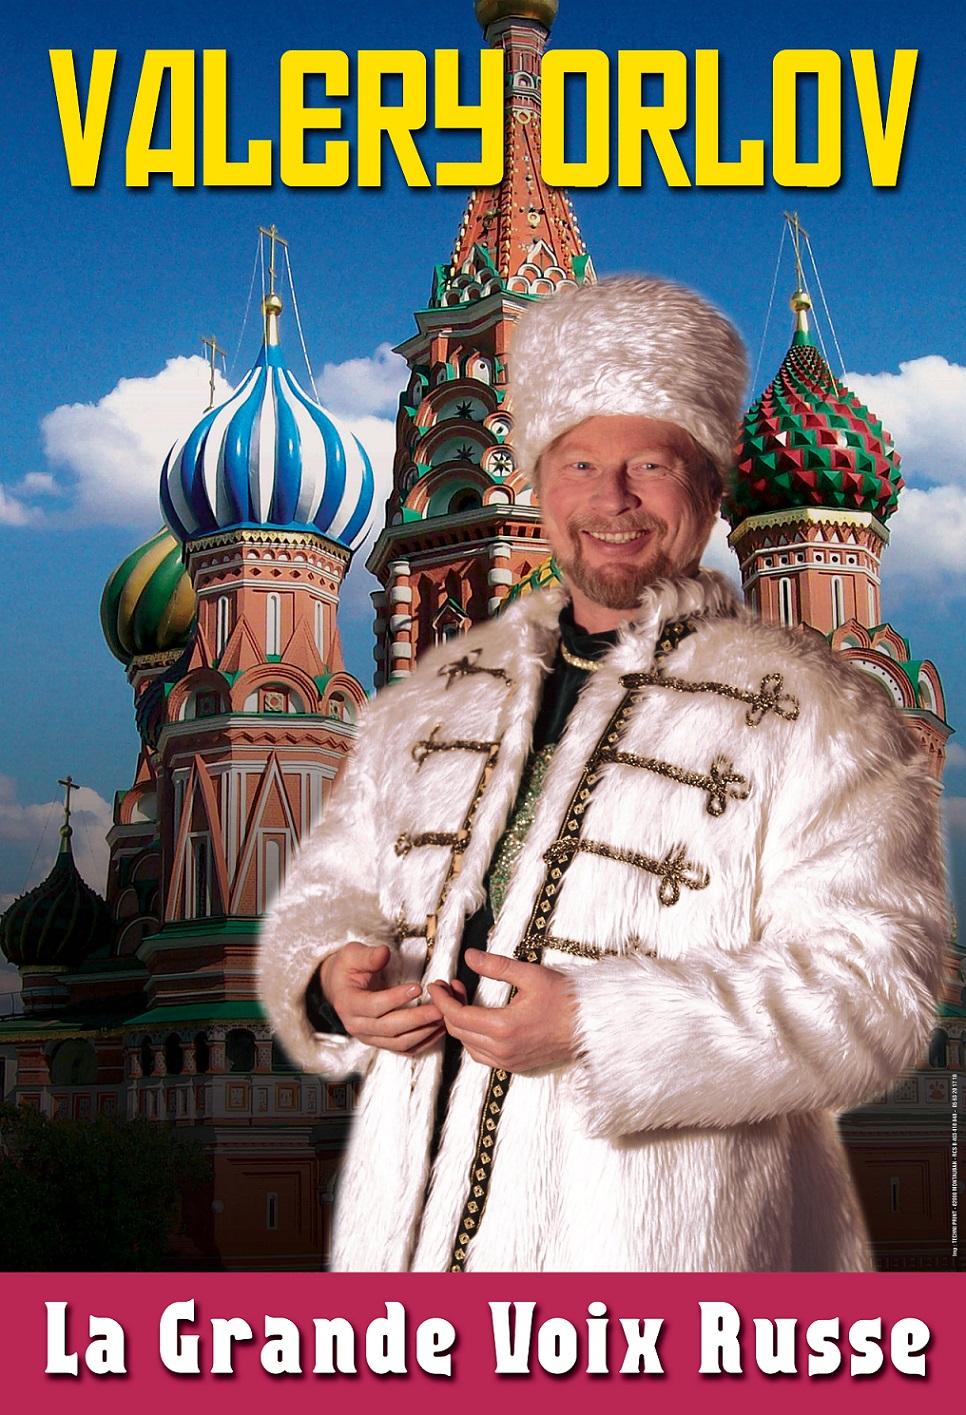 Concert de chants russes